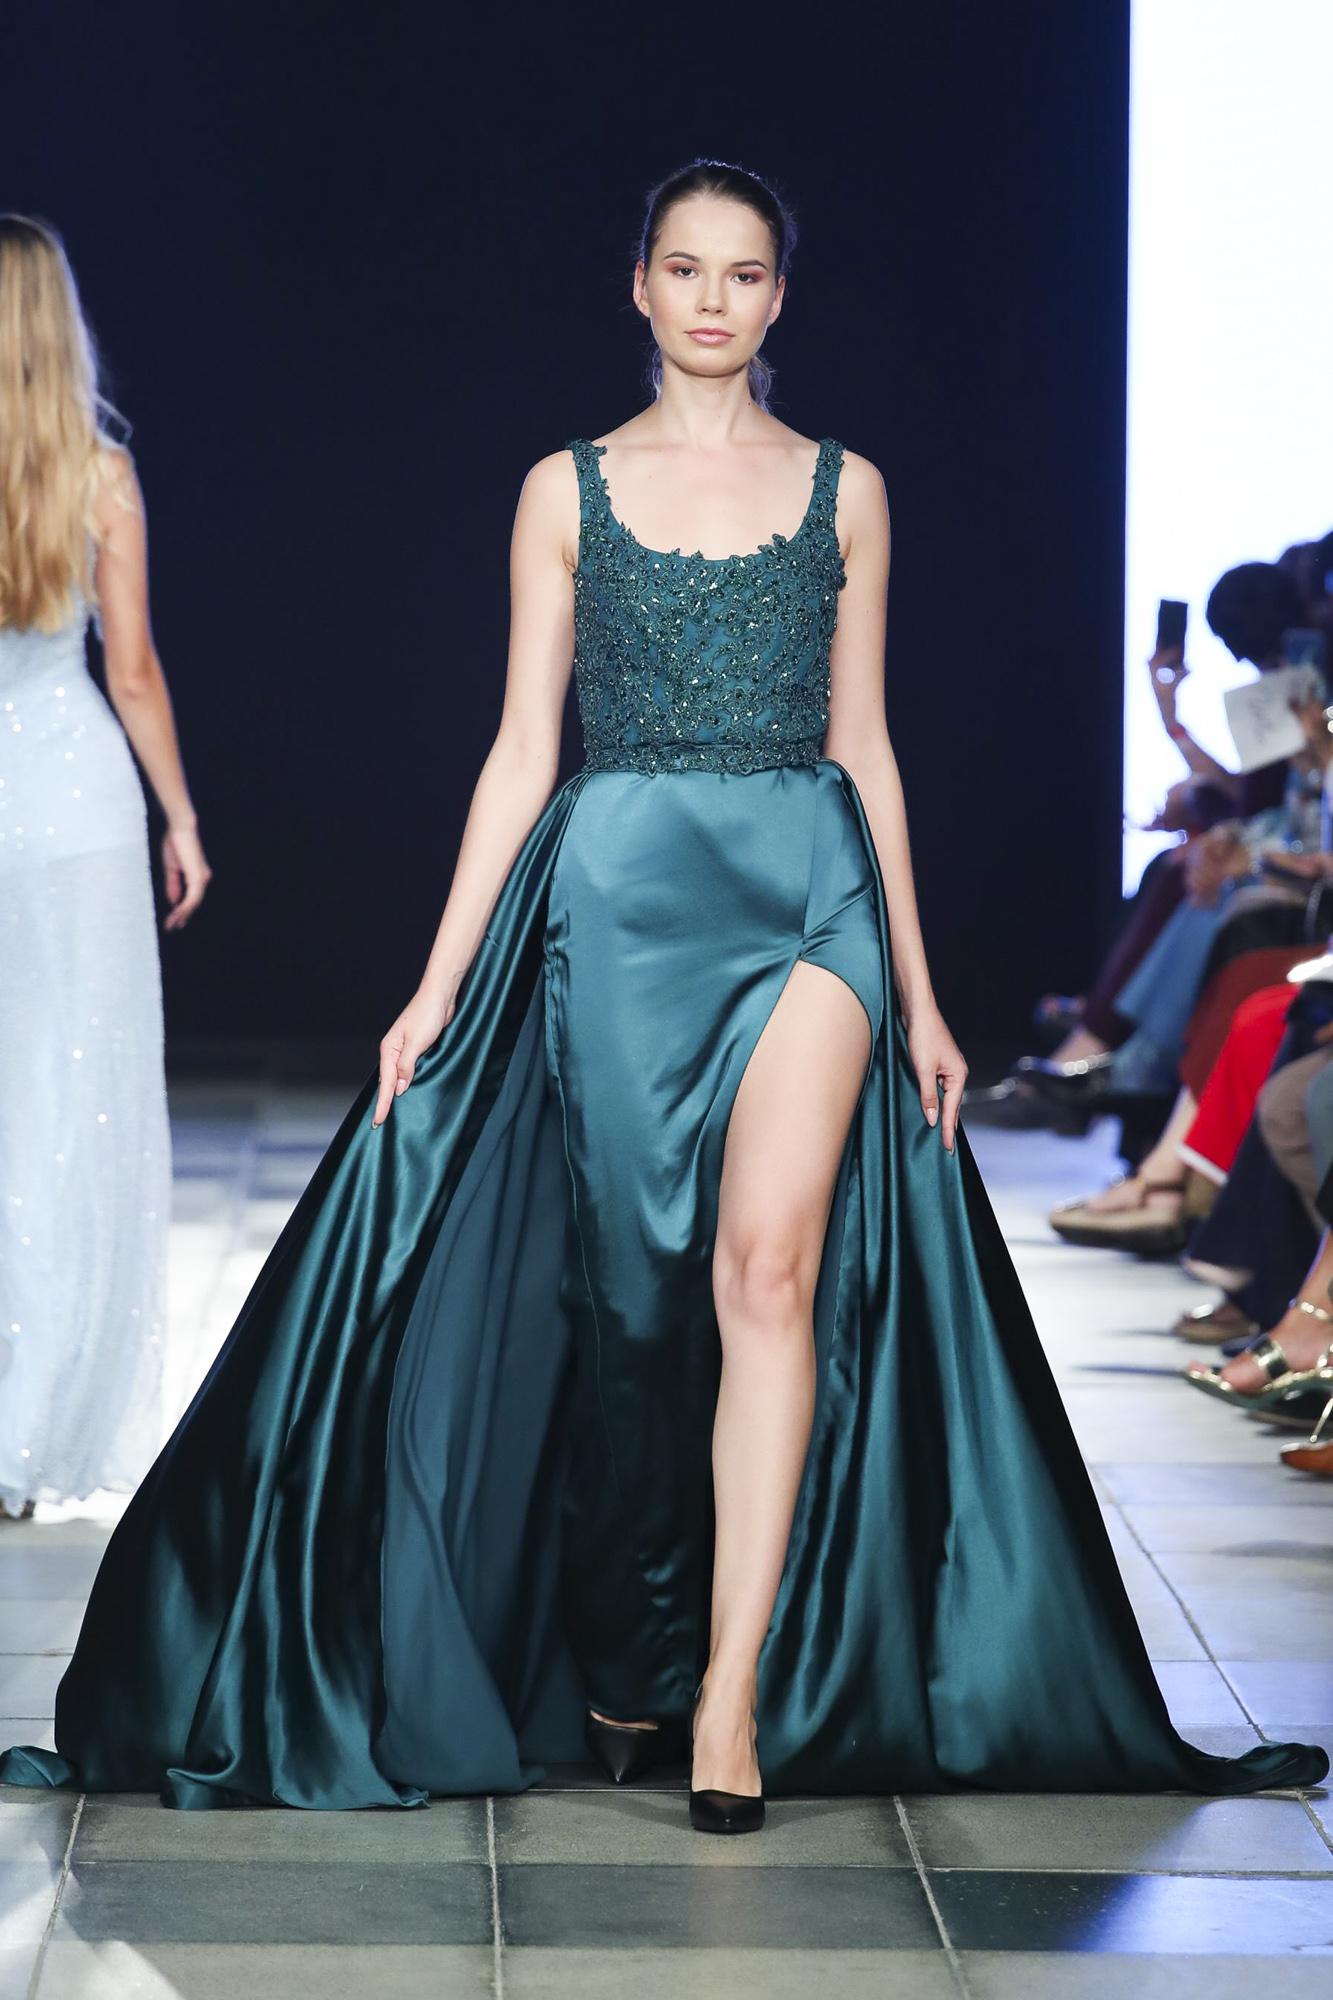 Mia Couture fashion show, Arab Fashion Week collection Spring Summer 2020 in Dubai